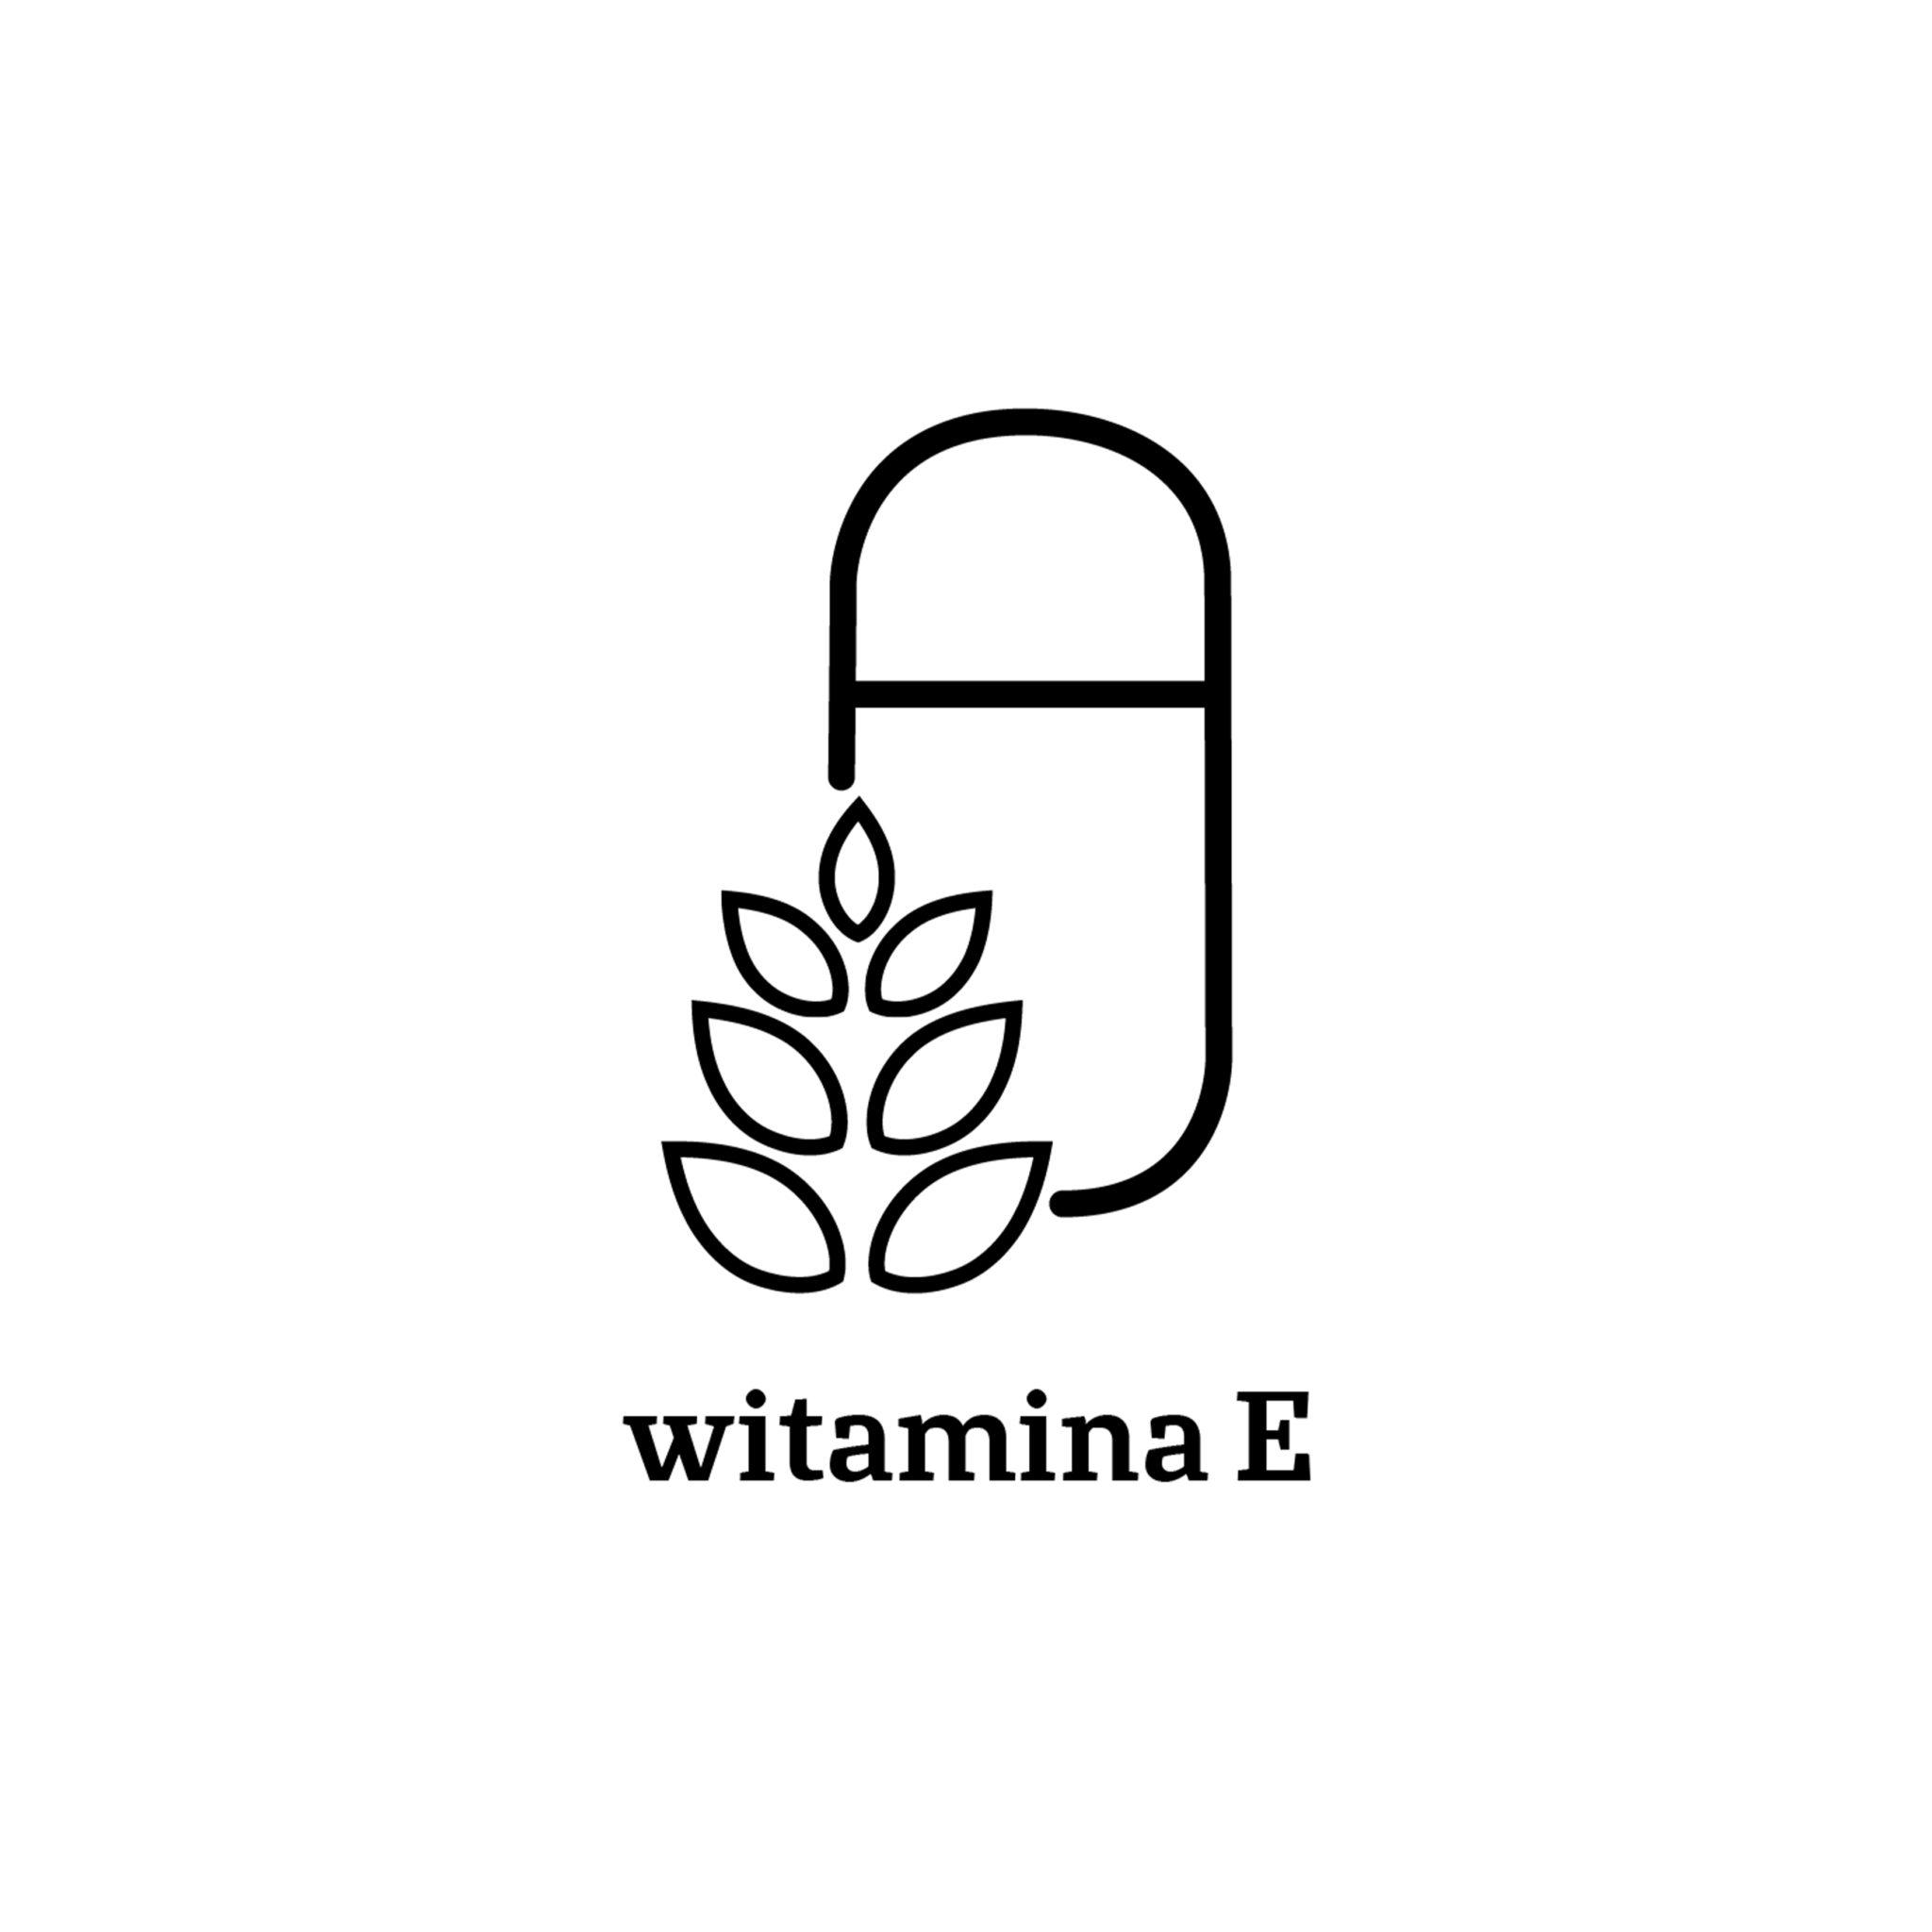 witaminaE